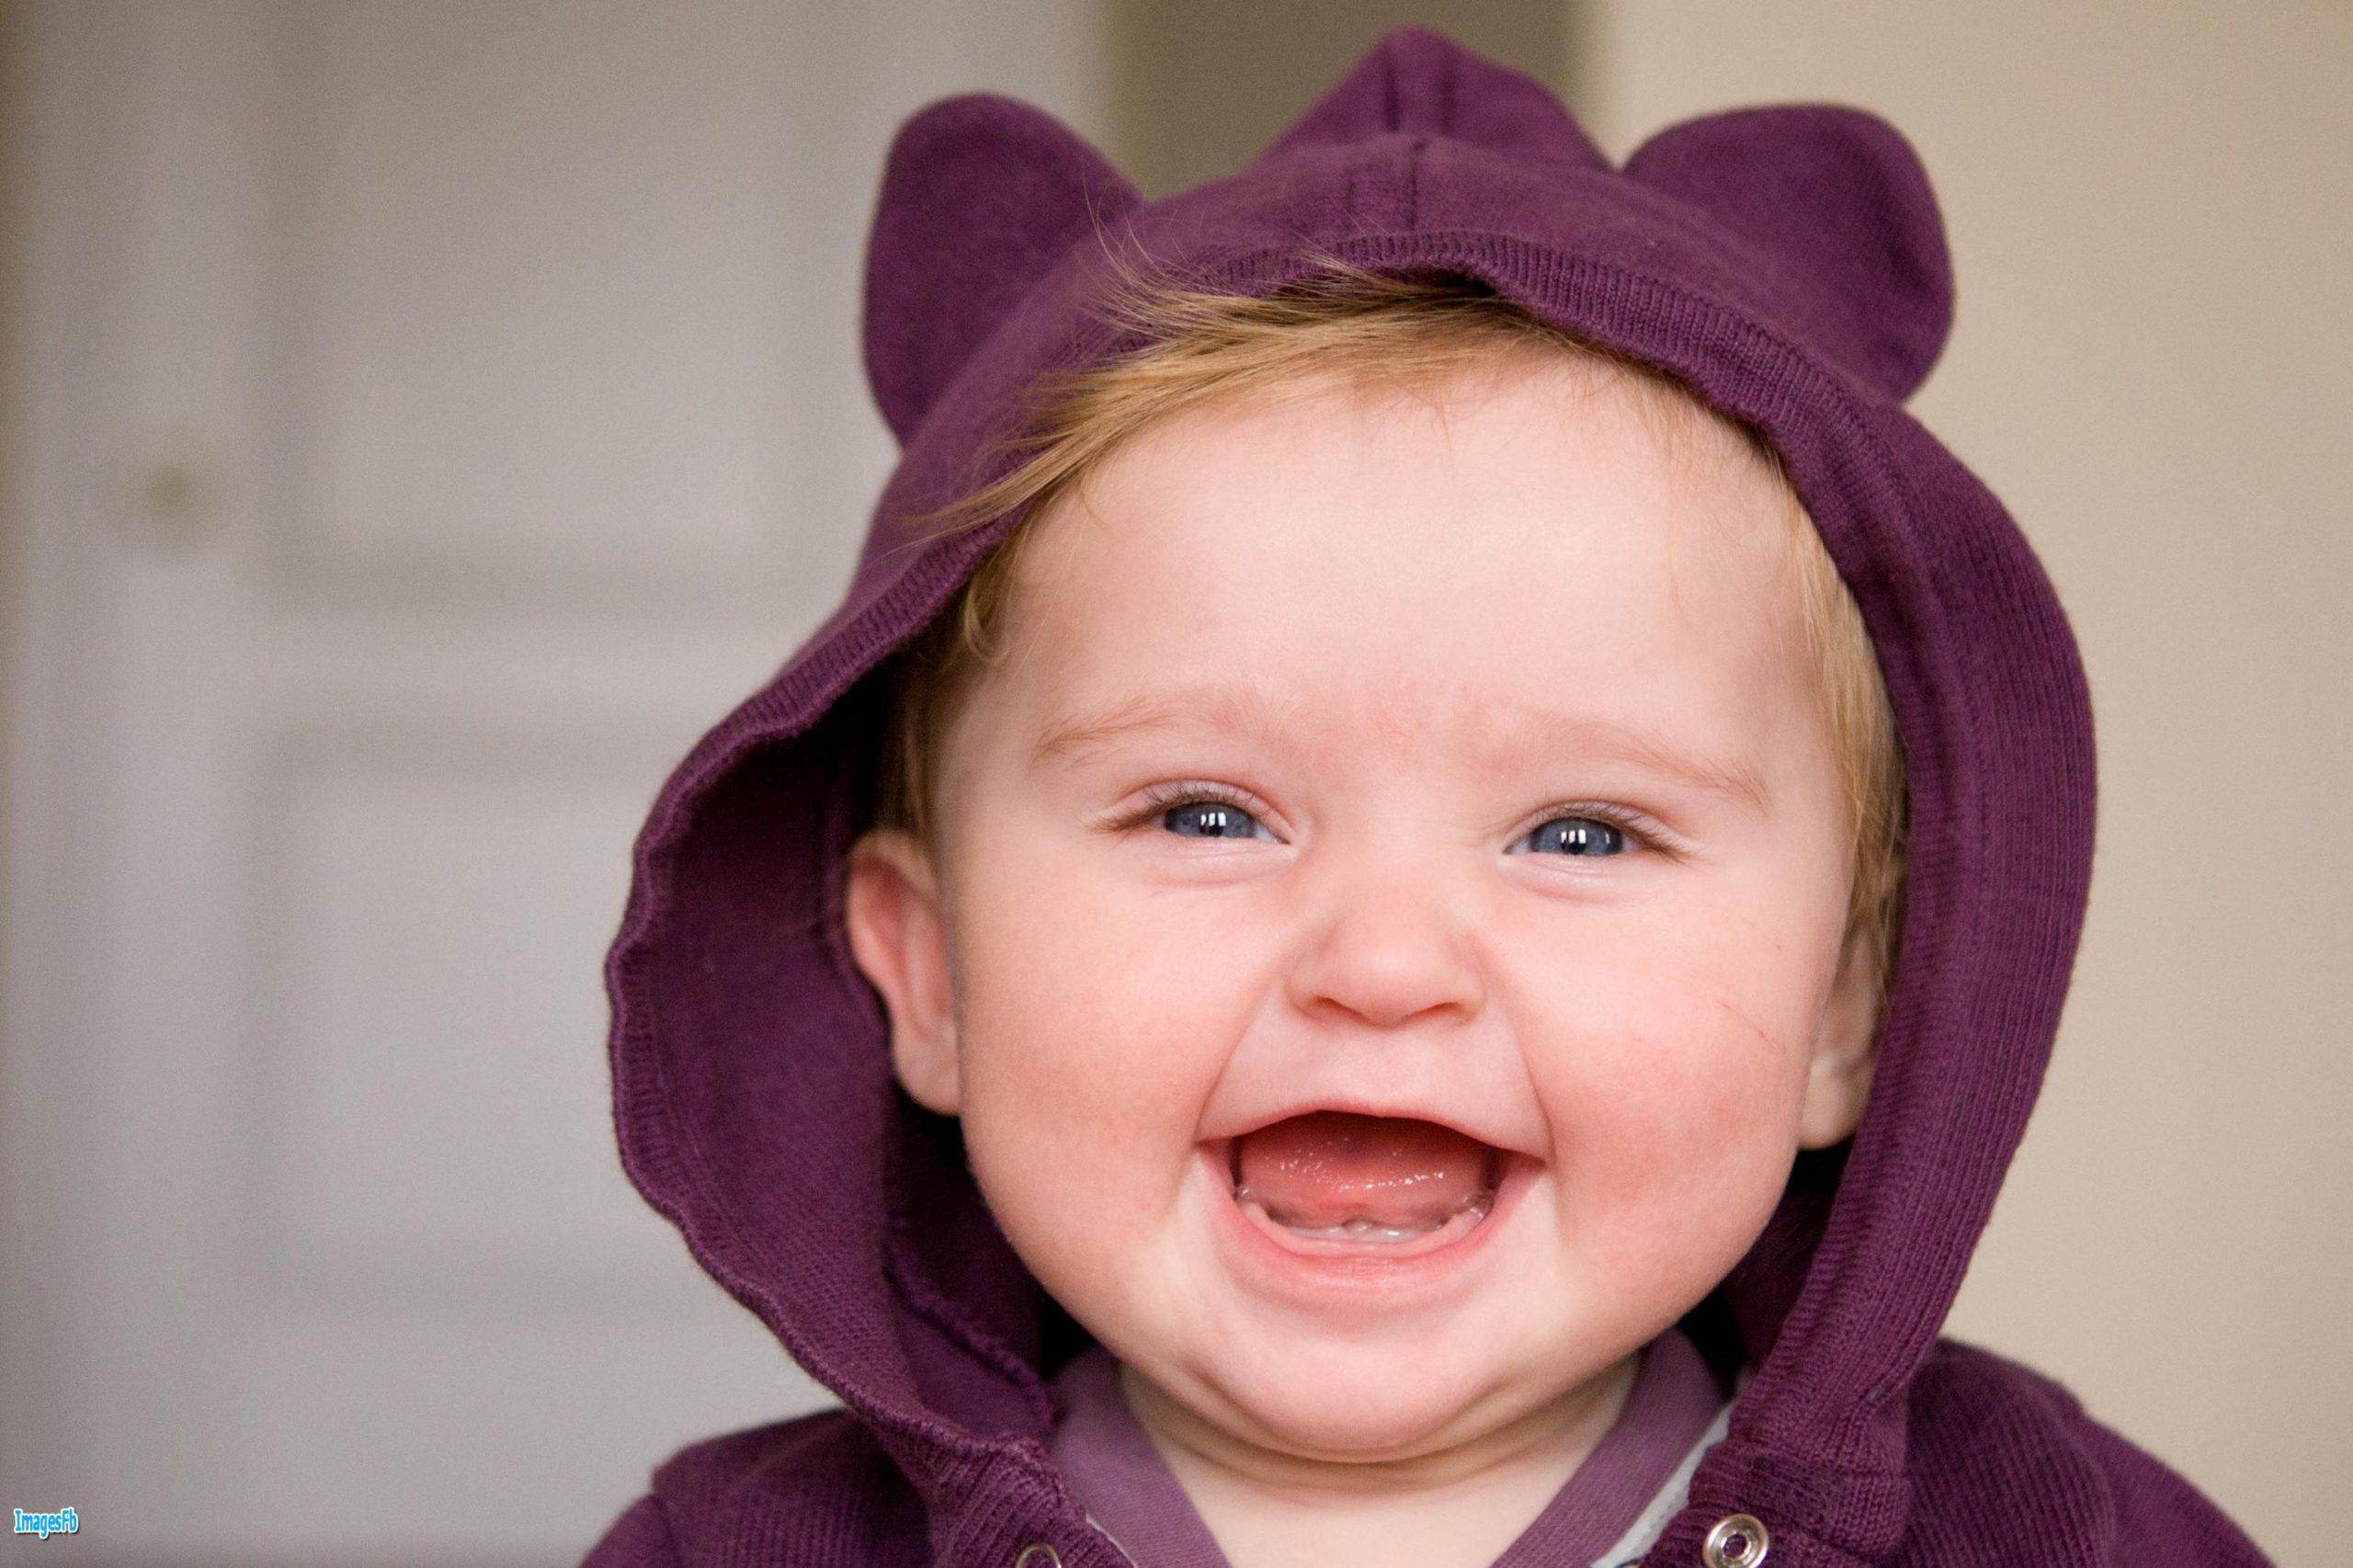 صور اطفال صور بيبي صور اولاد صور حلوين اطفال حلوينصور اطفال صغار2020 38